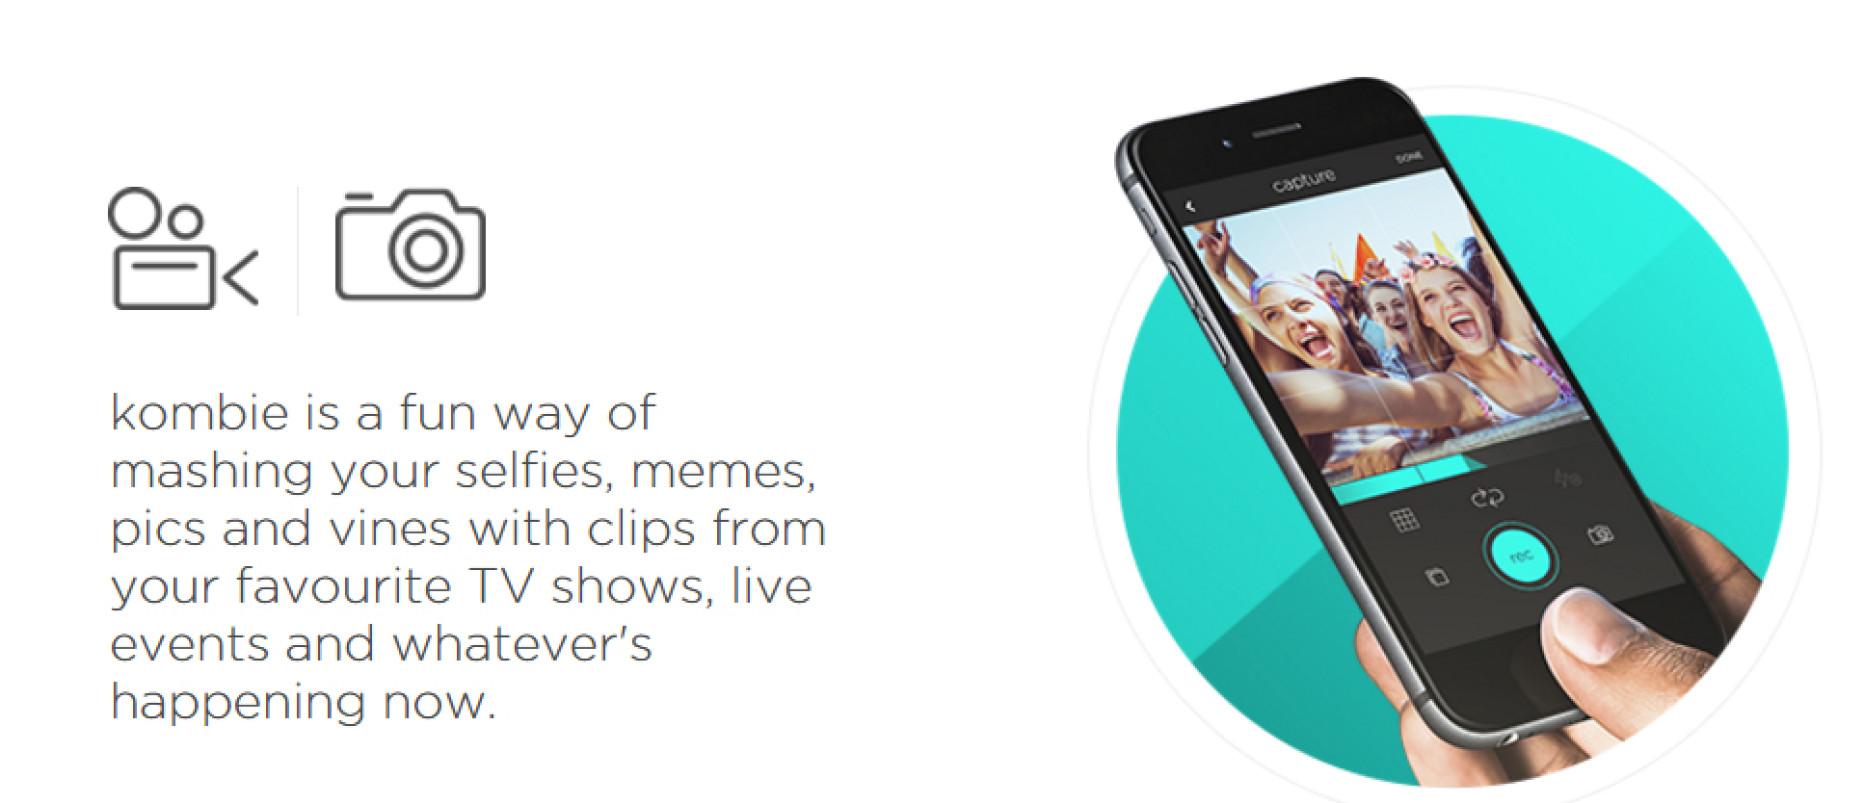 Kombie – Create Your Original Video Content